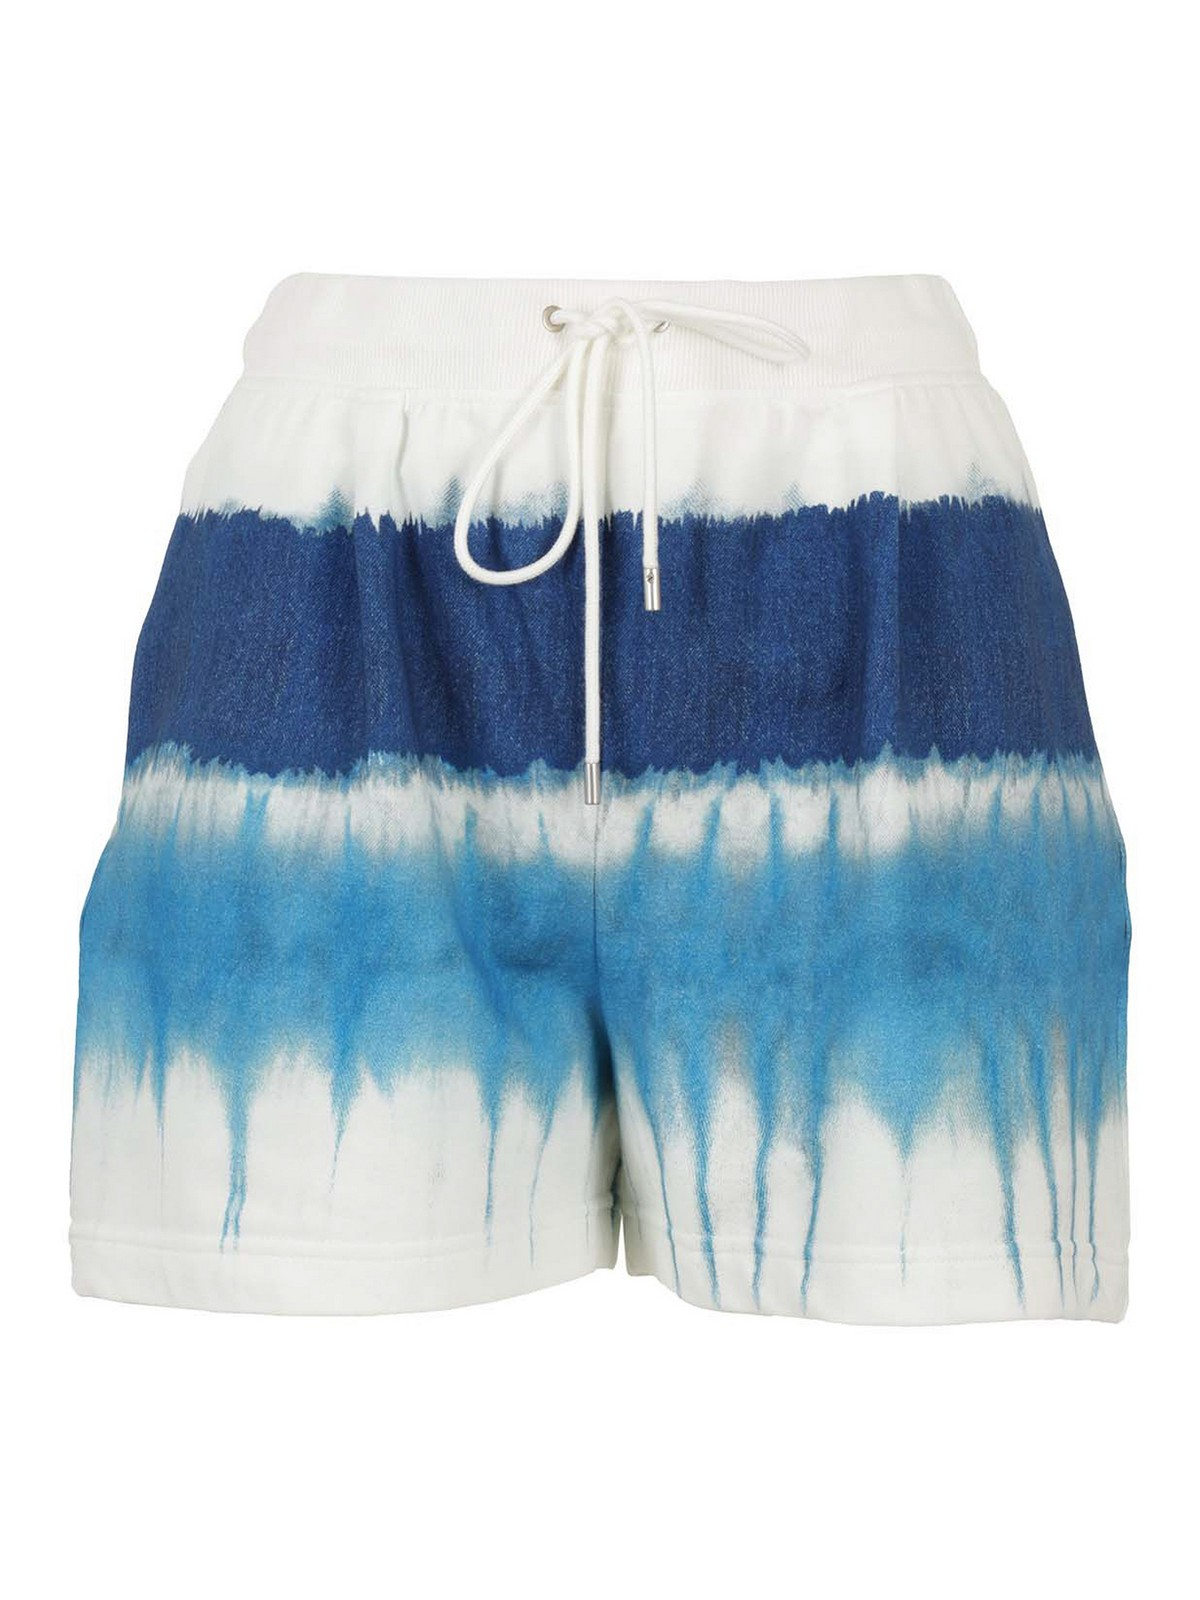 Alberta Ferretti Clothing I LOVE SUMMER SHORTS